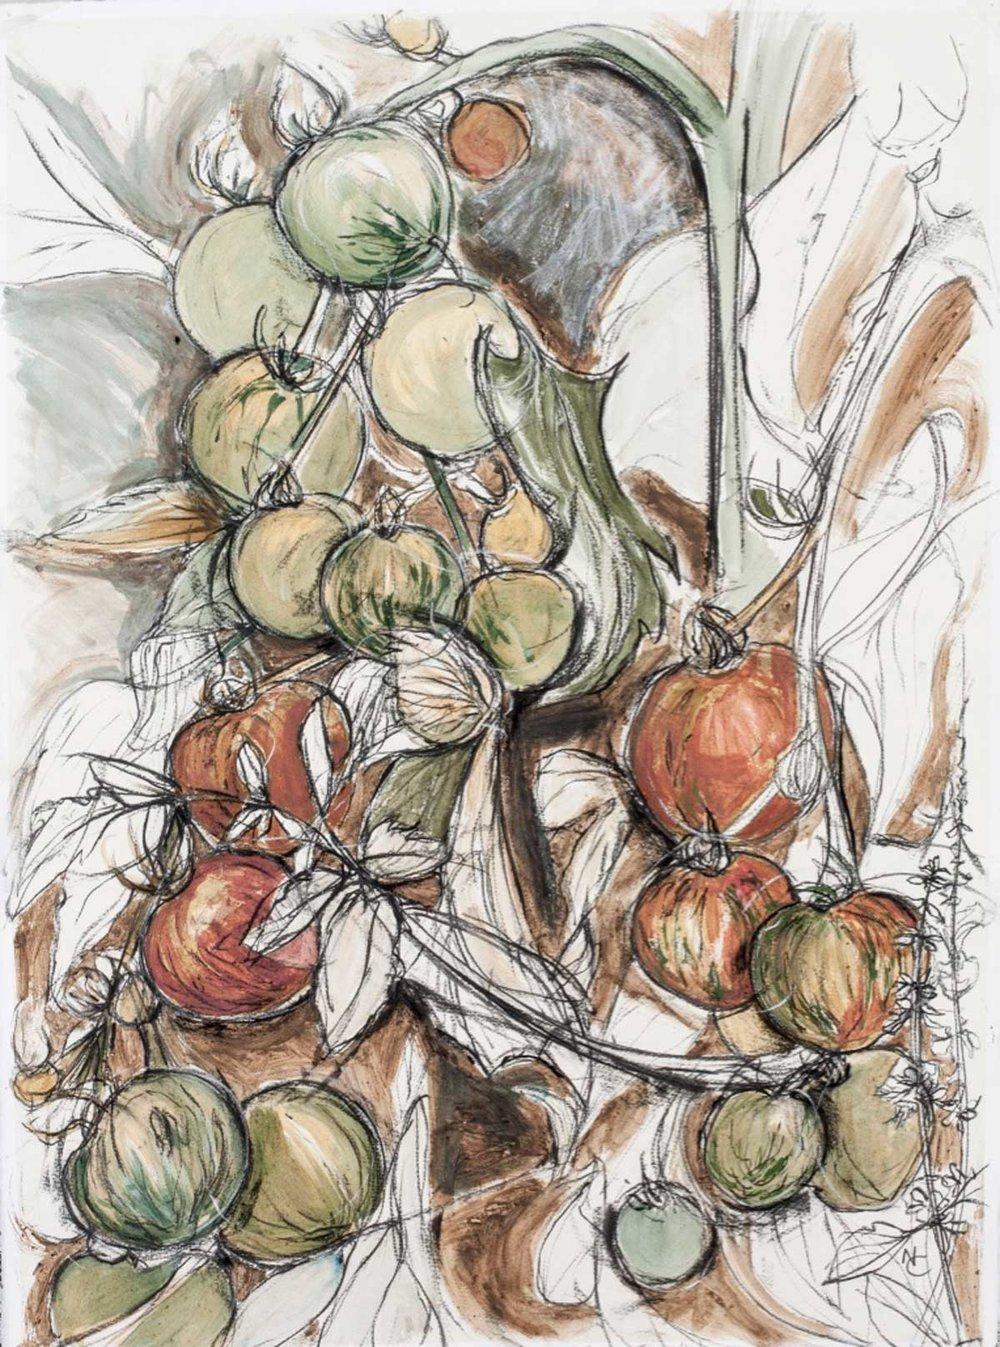 natasha-clutterbuck-tigerella-tomatoes.jpg